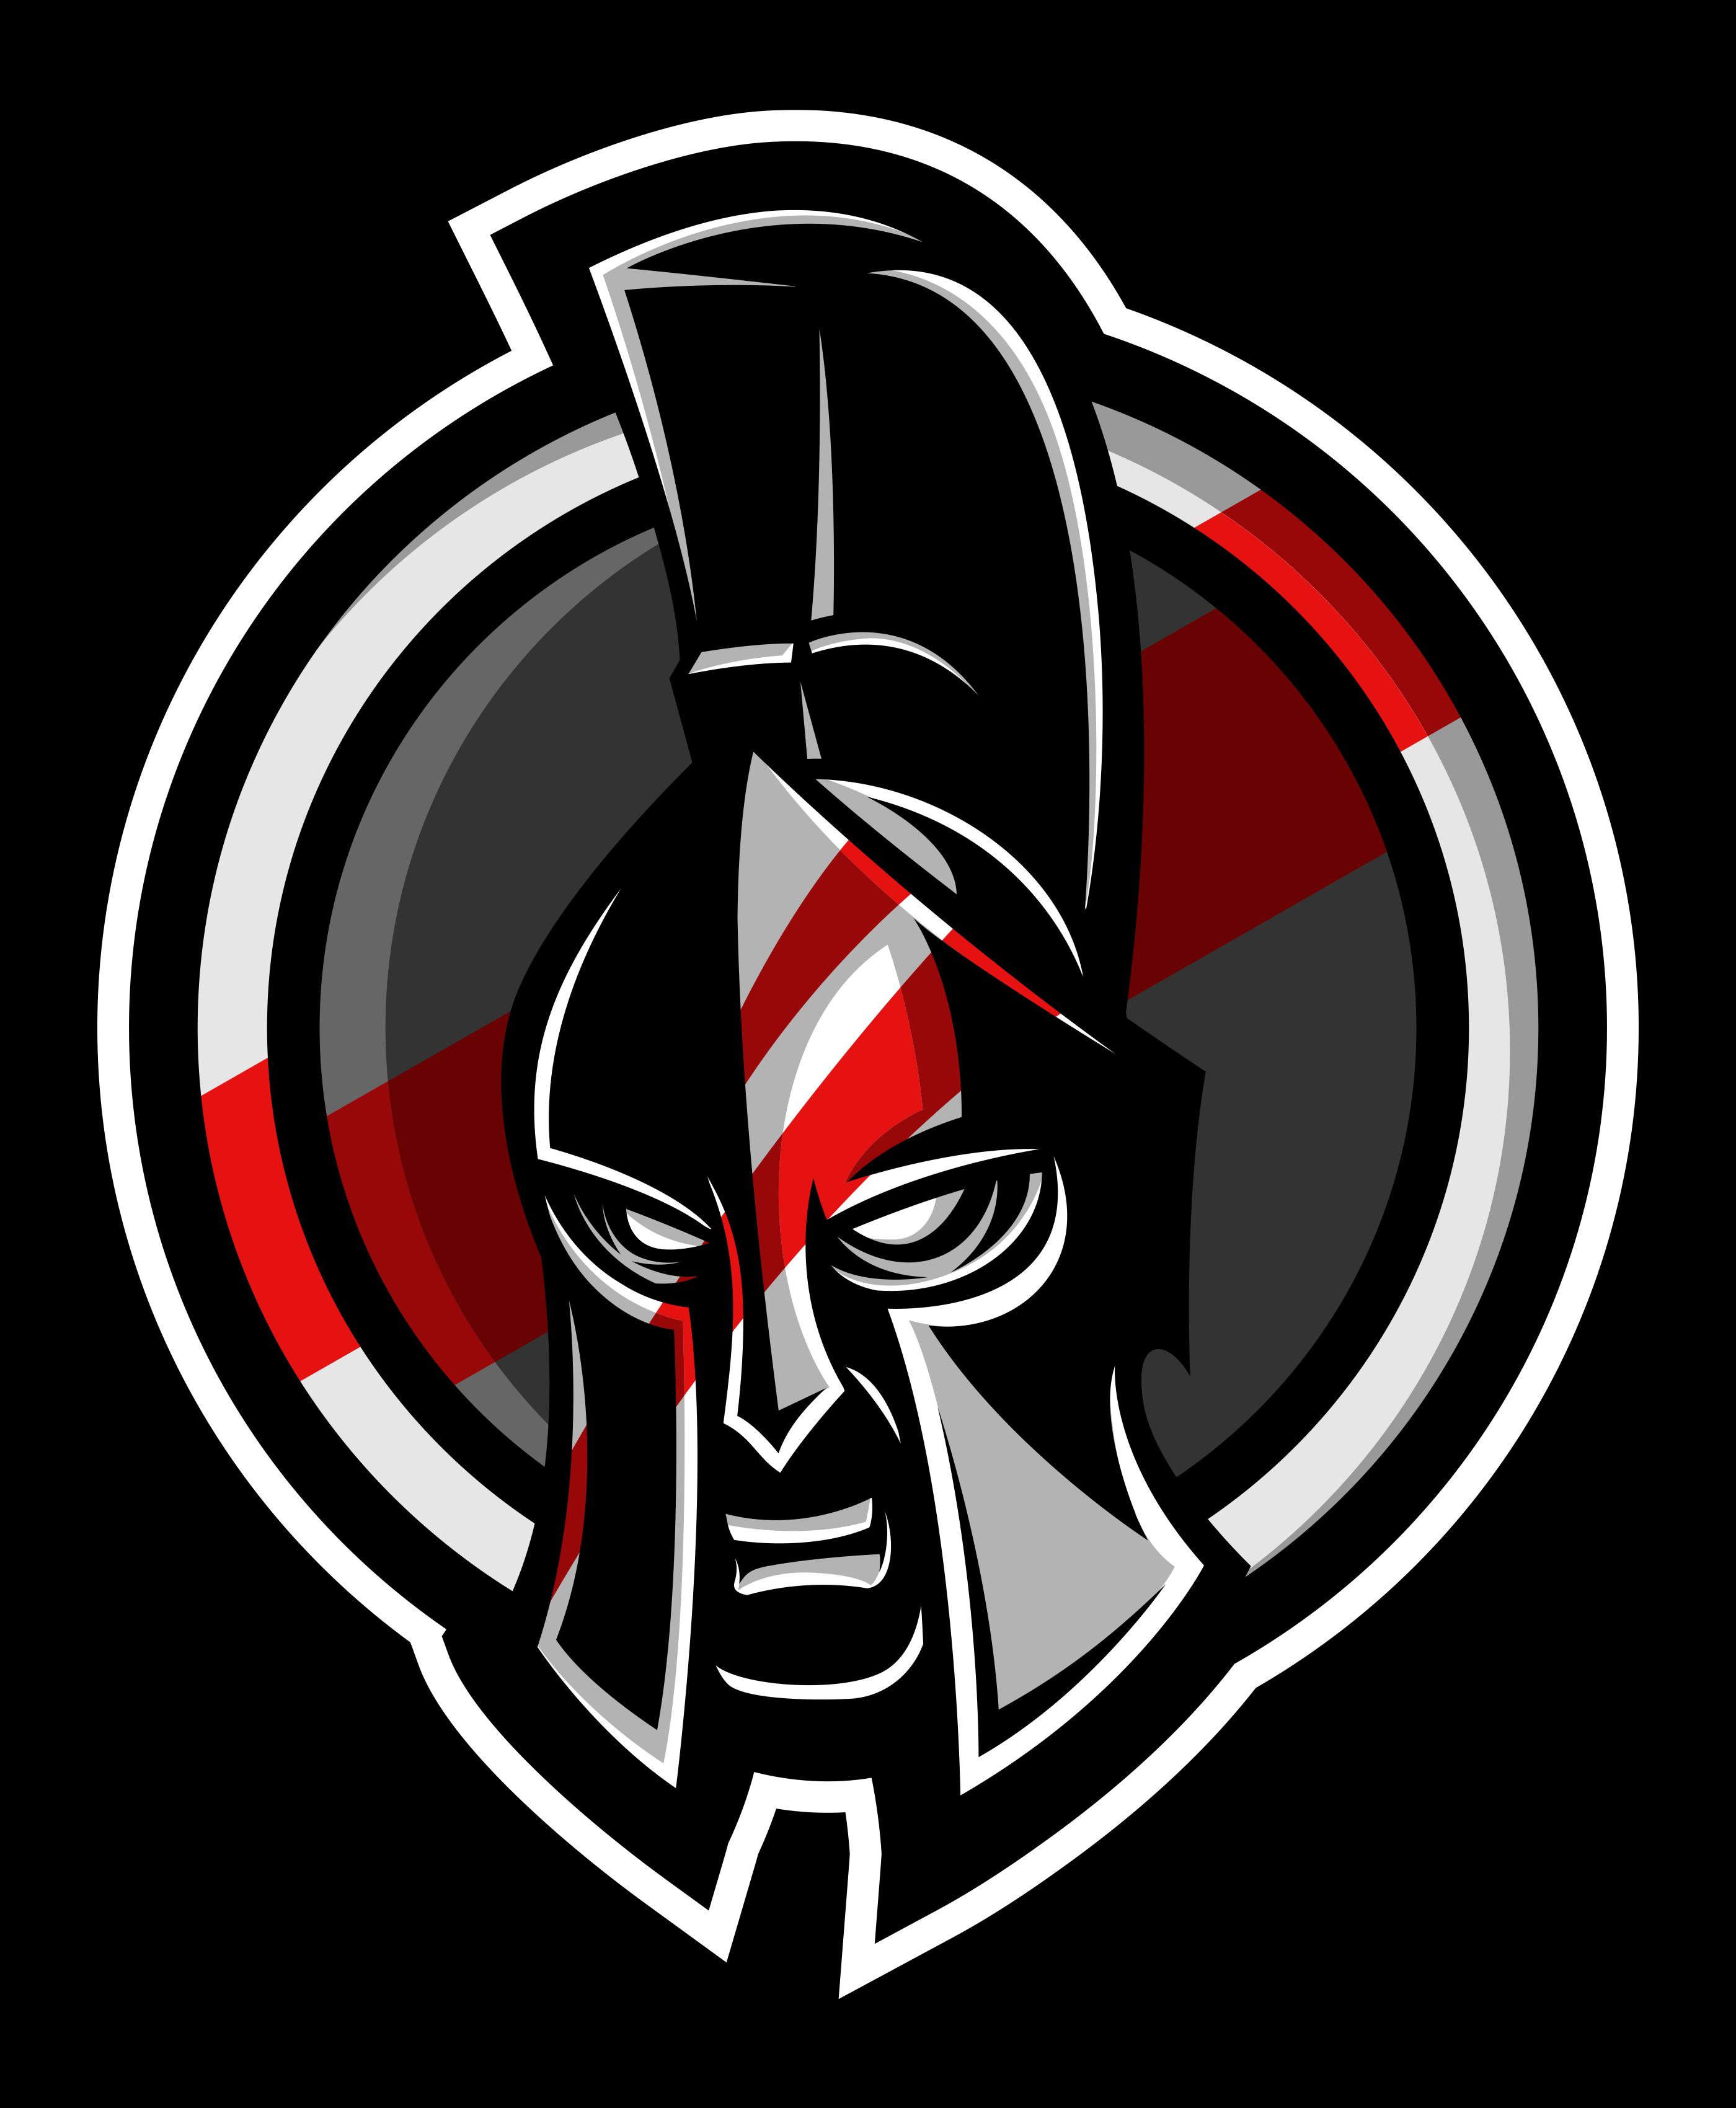 Spartan Helmet Circle Spartan Helmet Helmet Logo Spartan Logo